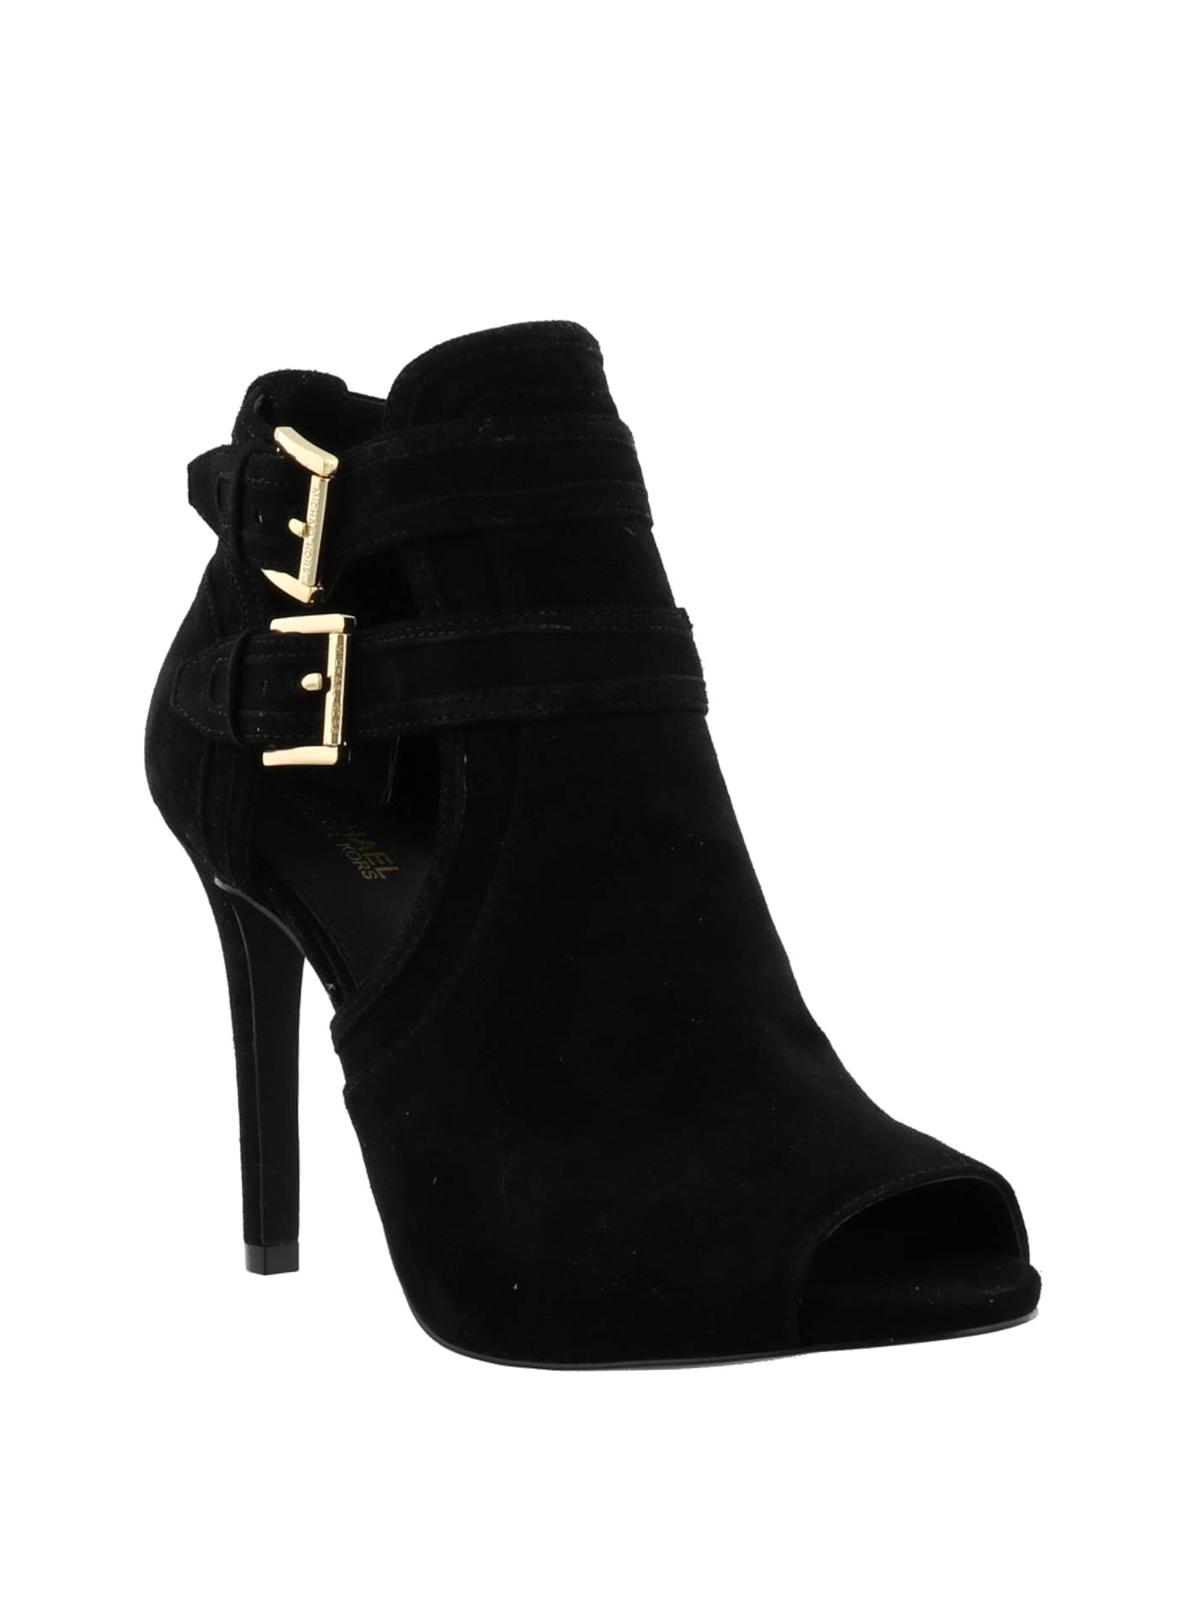 MICHAEL KORS  ankle boots online - Blaze open toe suede ankle boots b9a383c1672